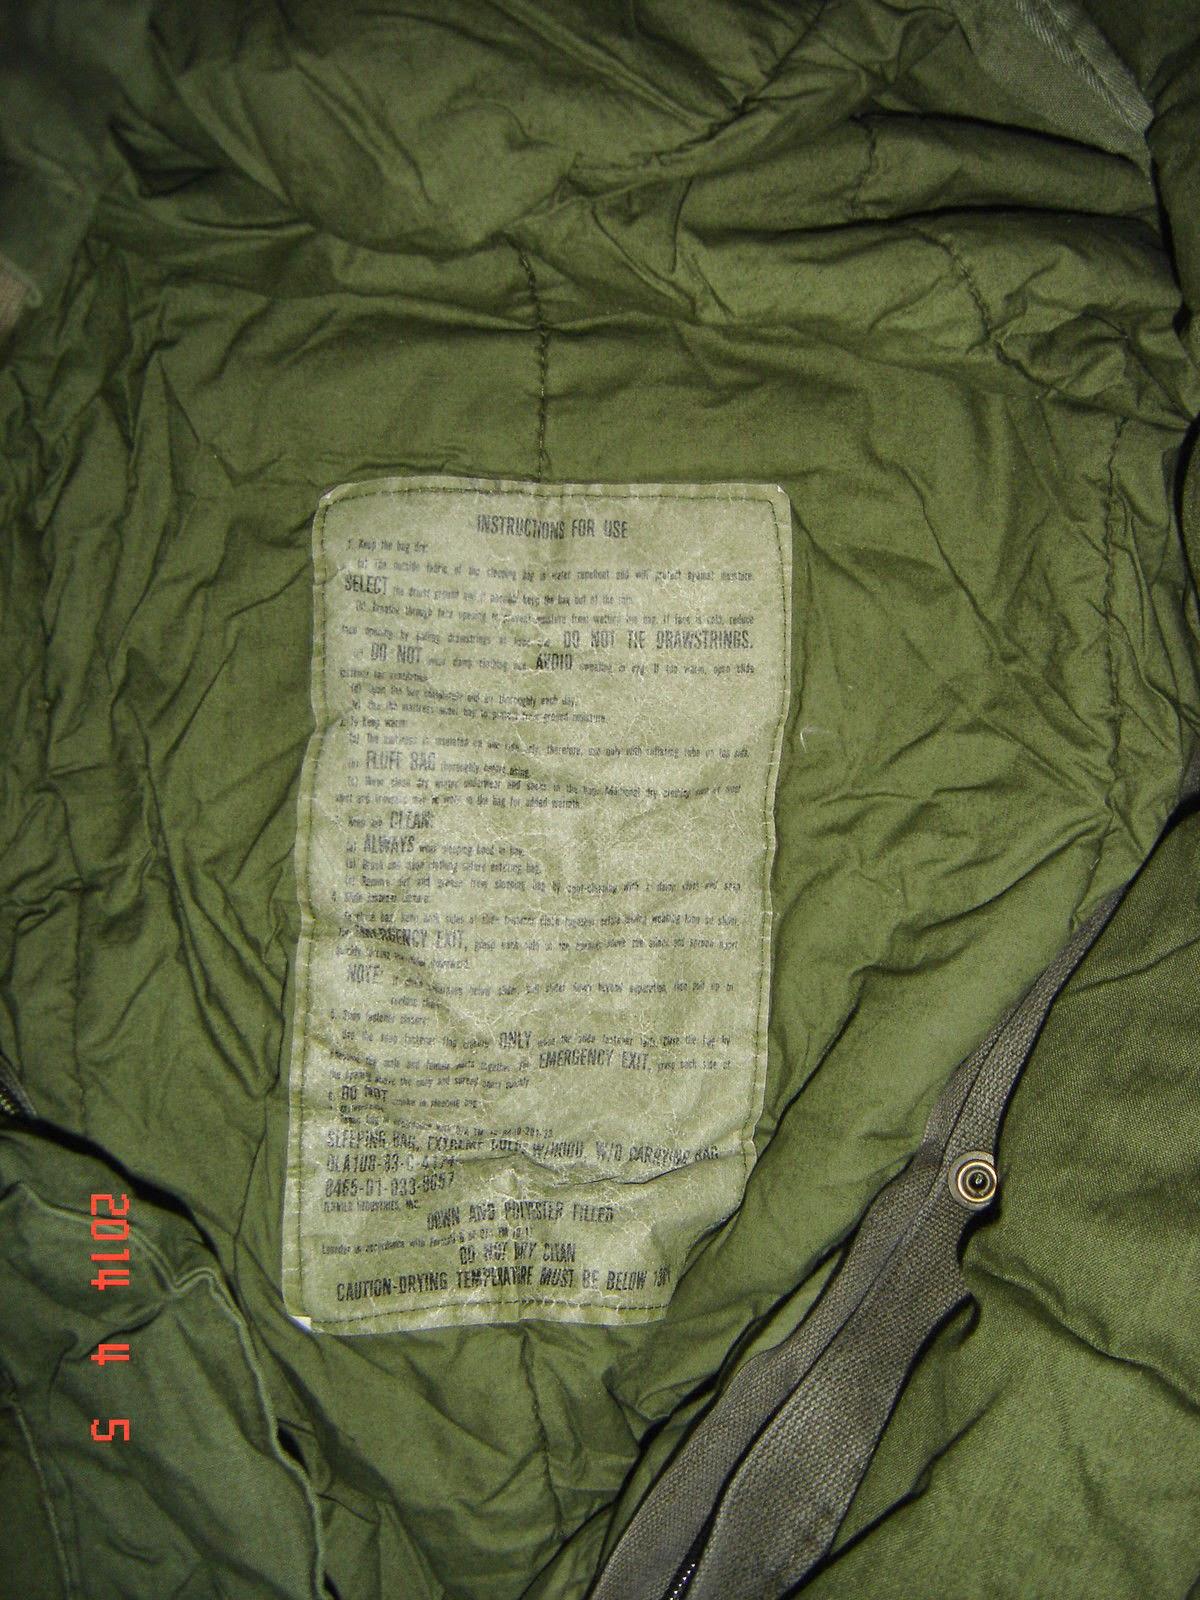 Webbingbabel: US Army Extreme Cold Weather Sleeping Bag ...